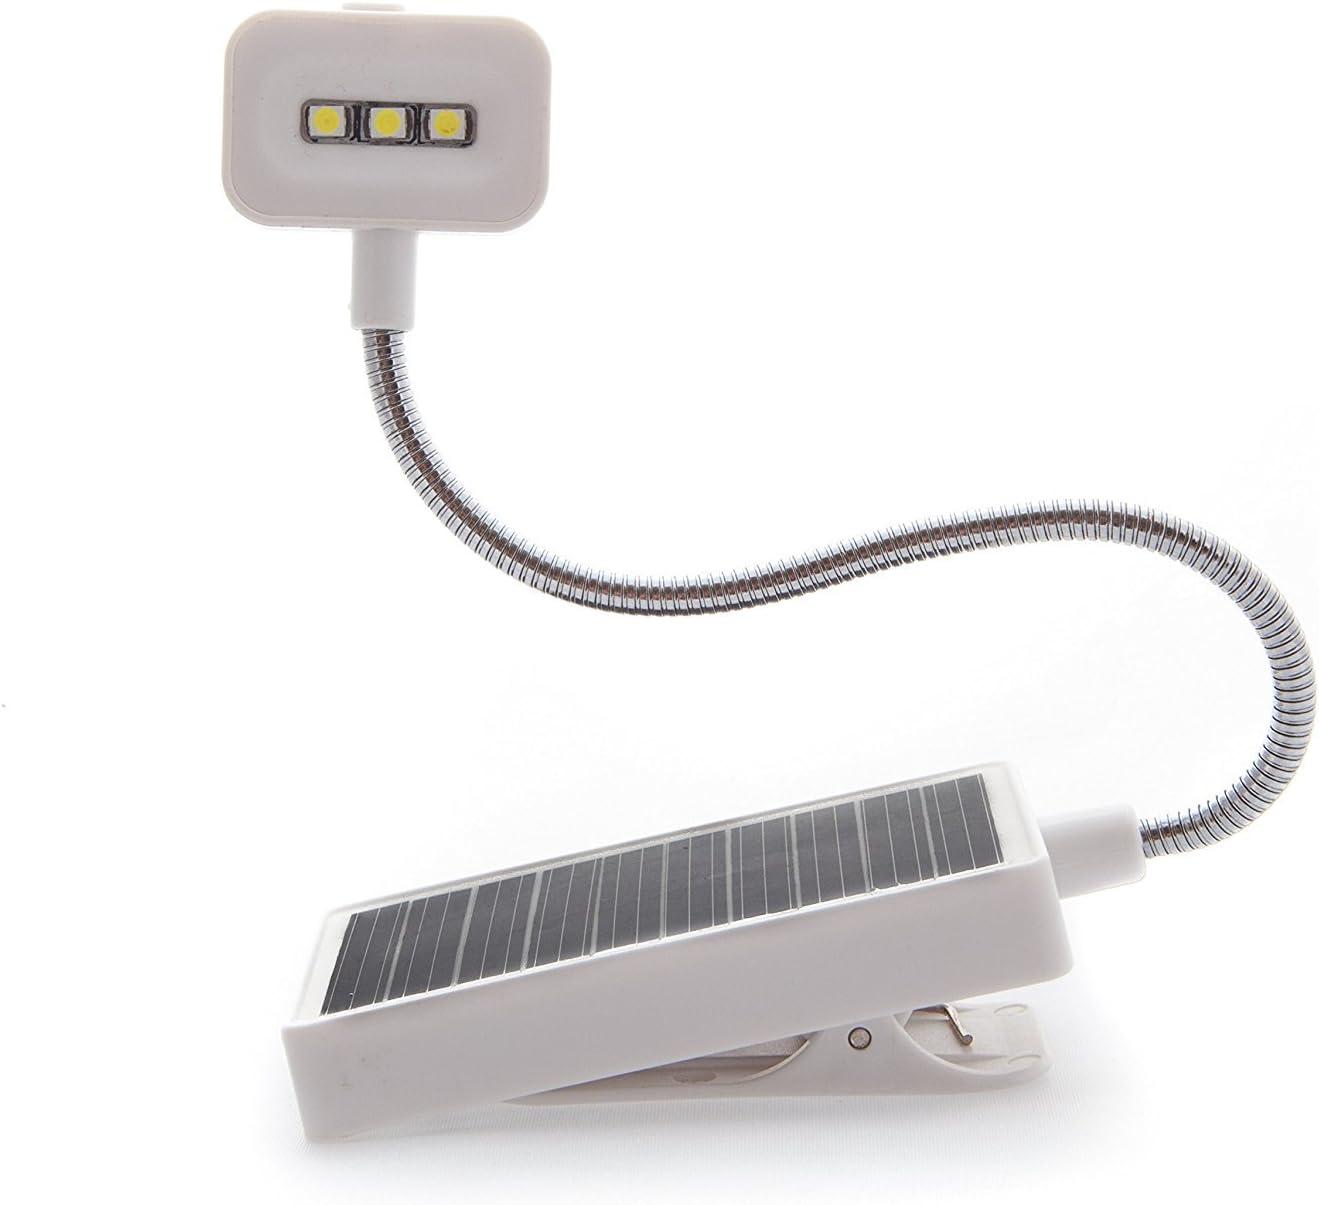 Solar Clip on Book Light,Glovion LED Reading Light USB Rechargeable and Solar Powered,2 Brightness Settings Flexible Neck/& Clip-on-White